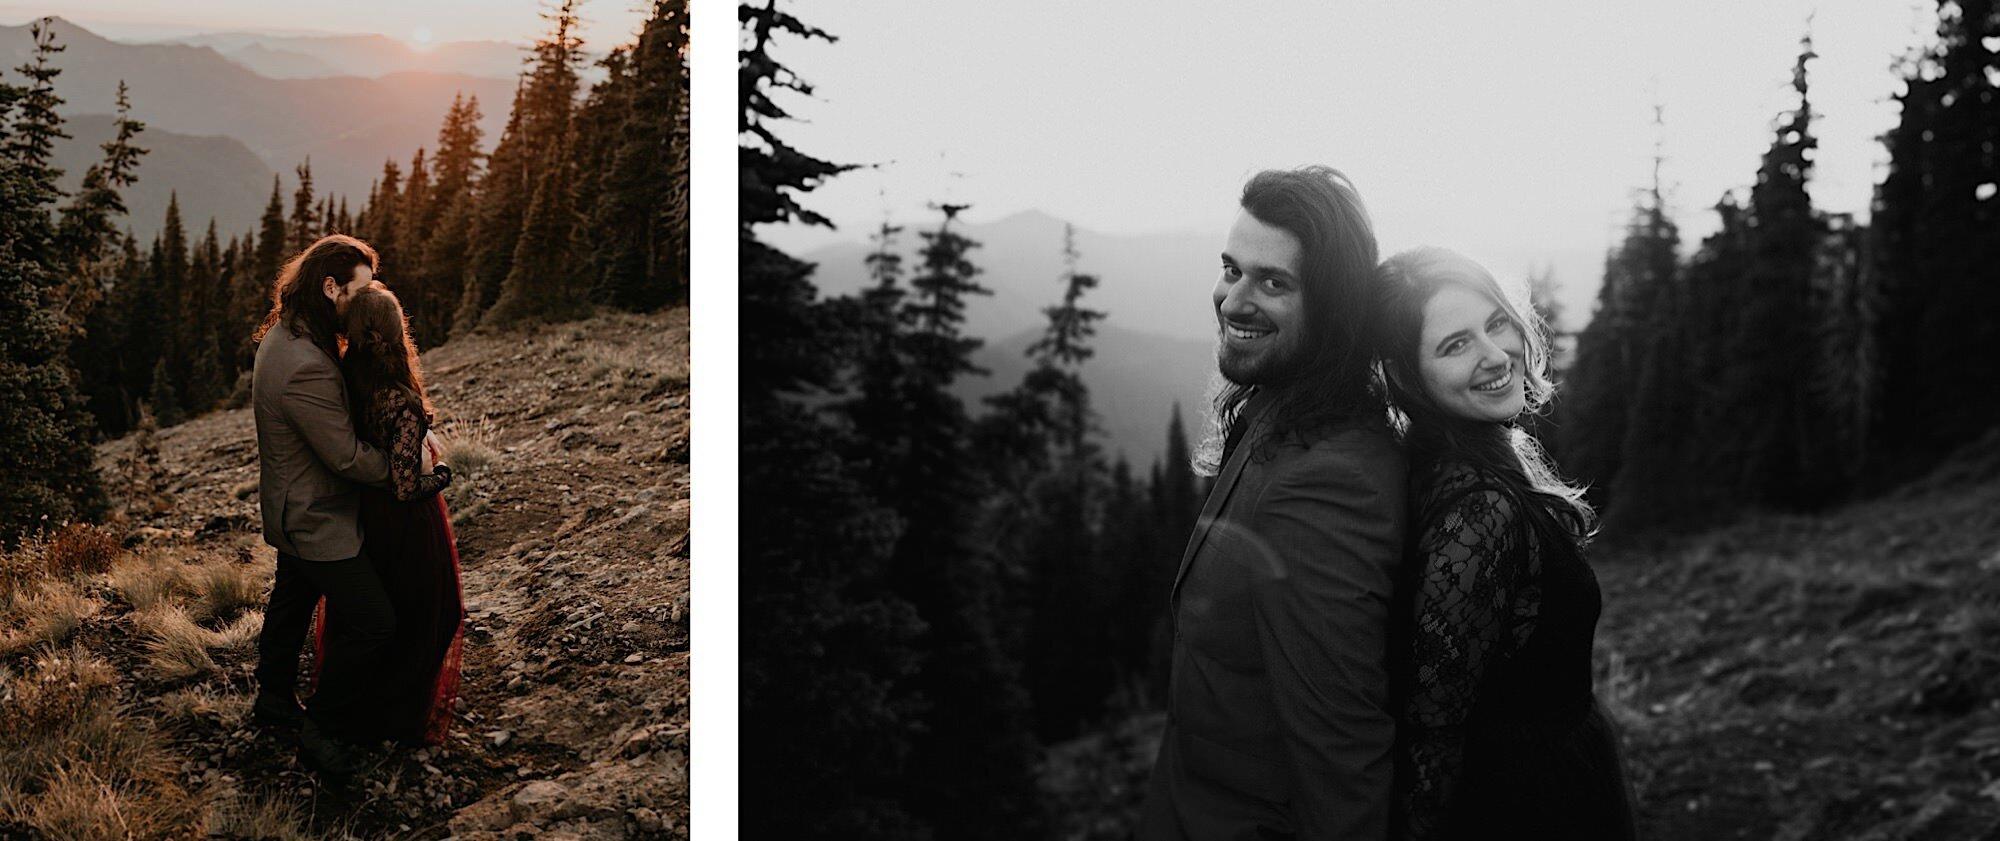 mount-rainier-hiking-adventure-elopement-16.jpg